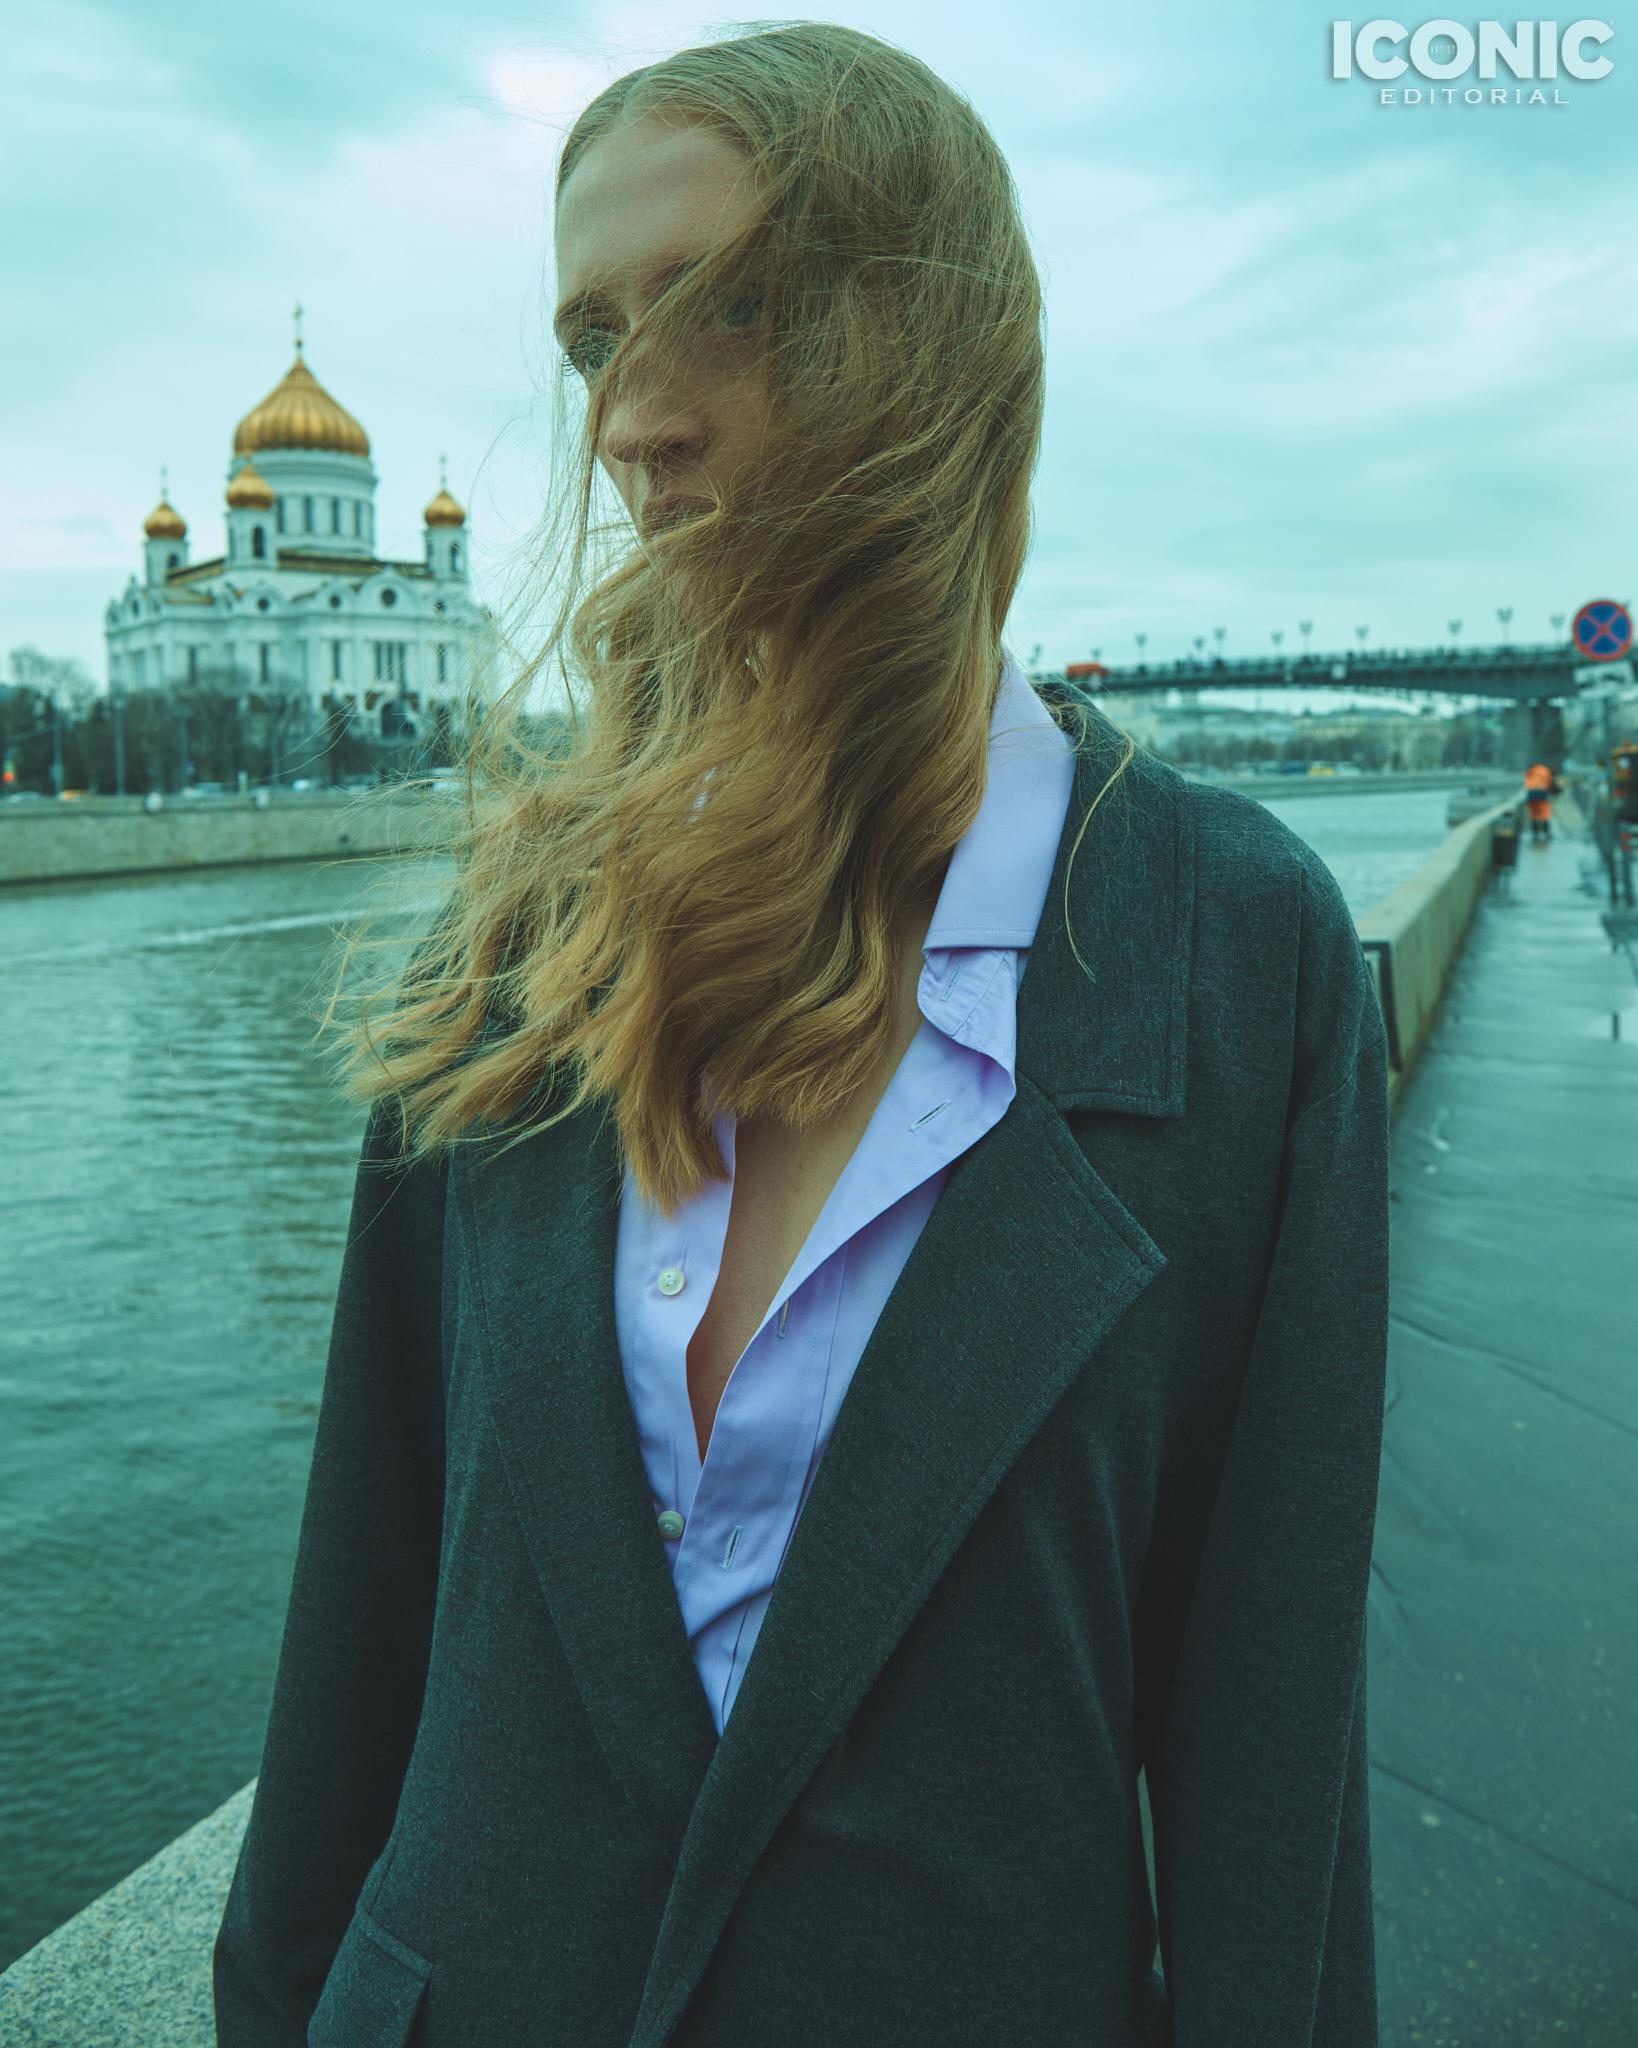 2/15  Suit |  @artemshumov  Shirt | Muss  © Alej Fernández